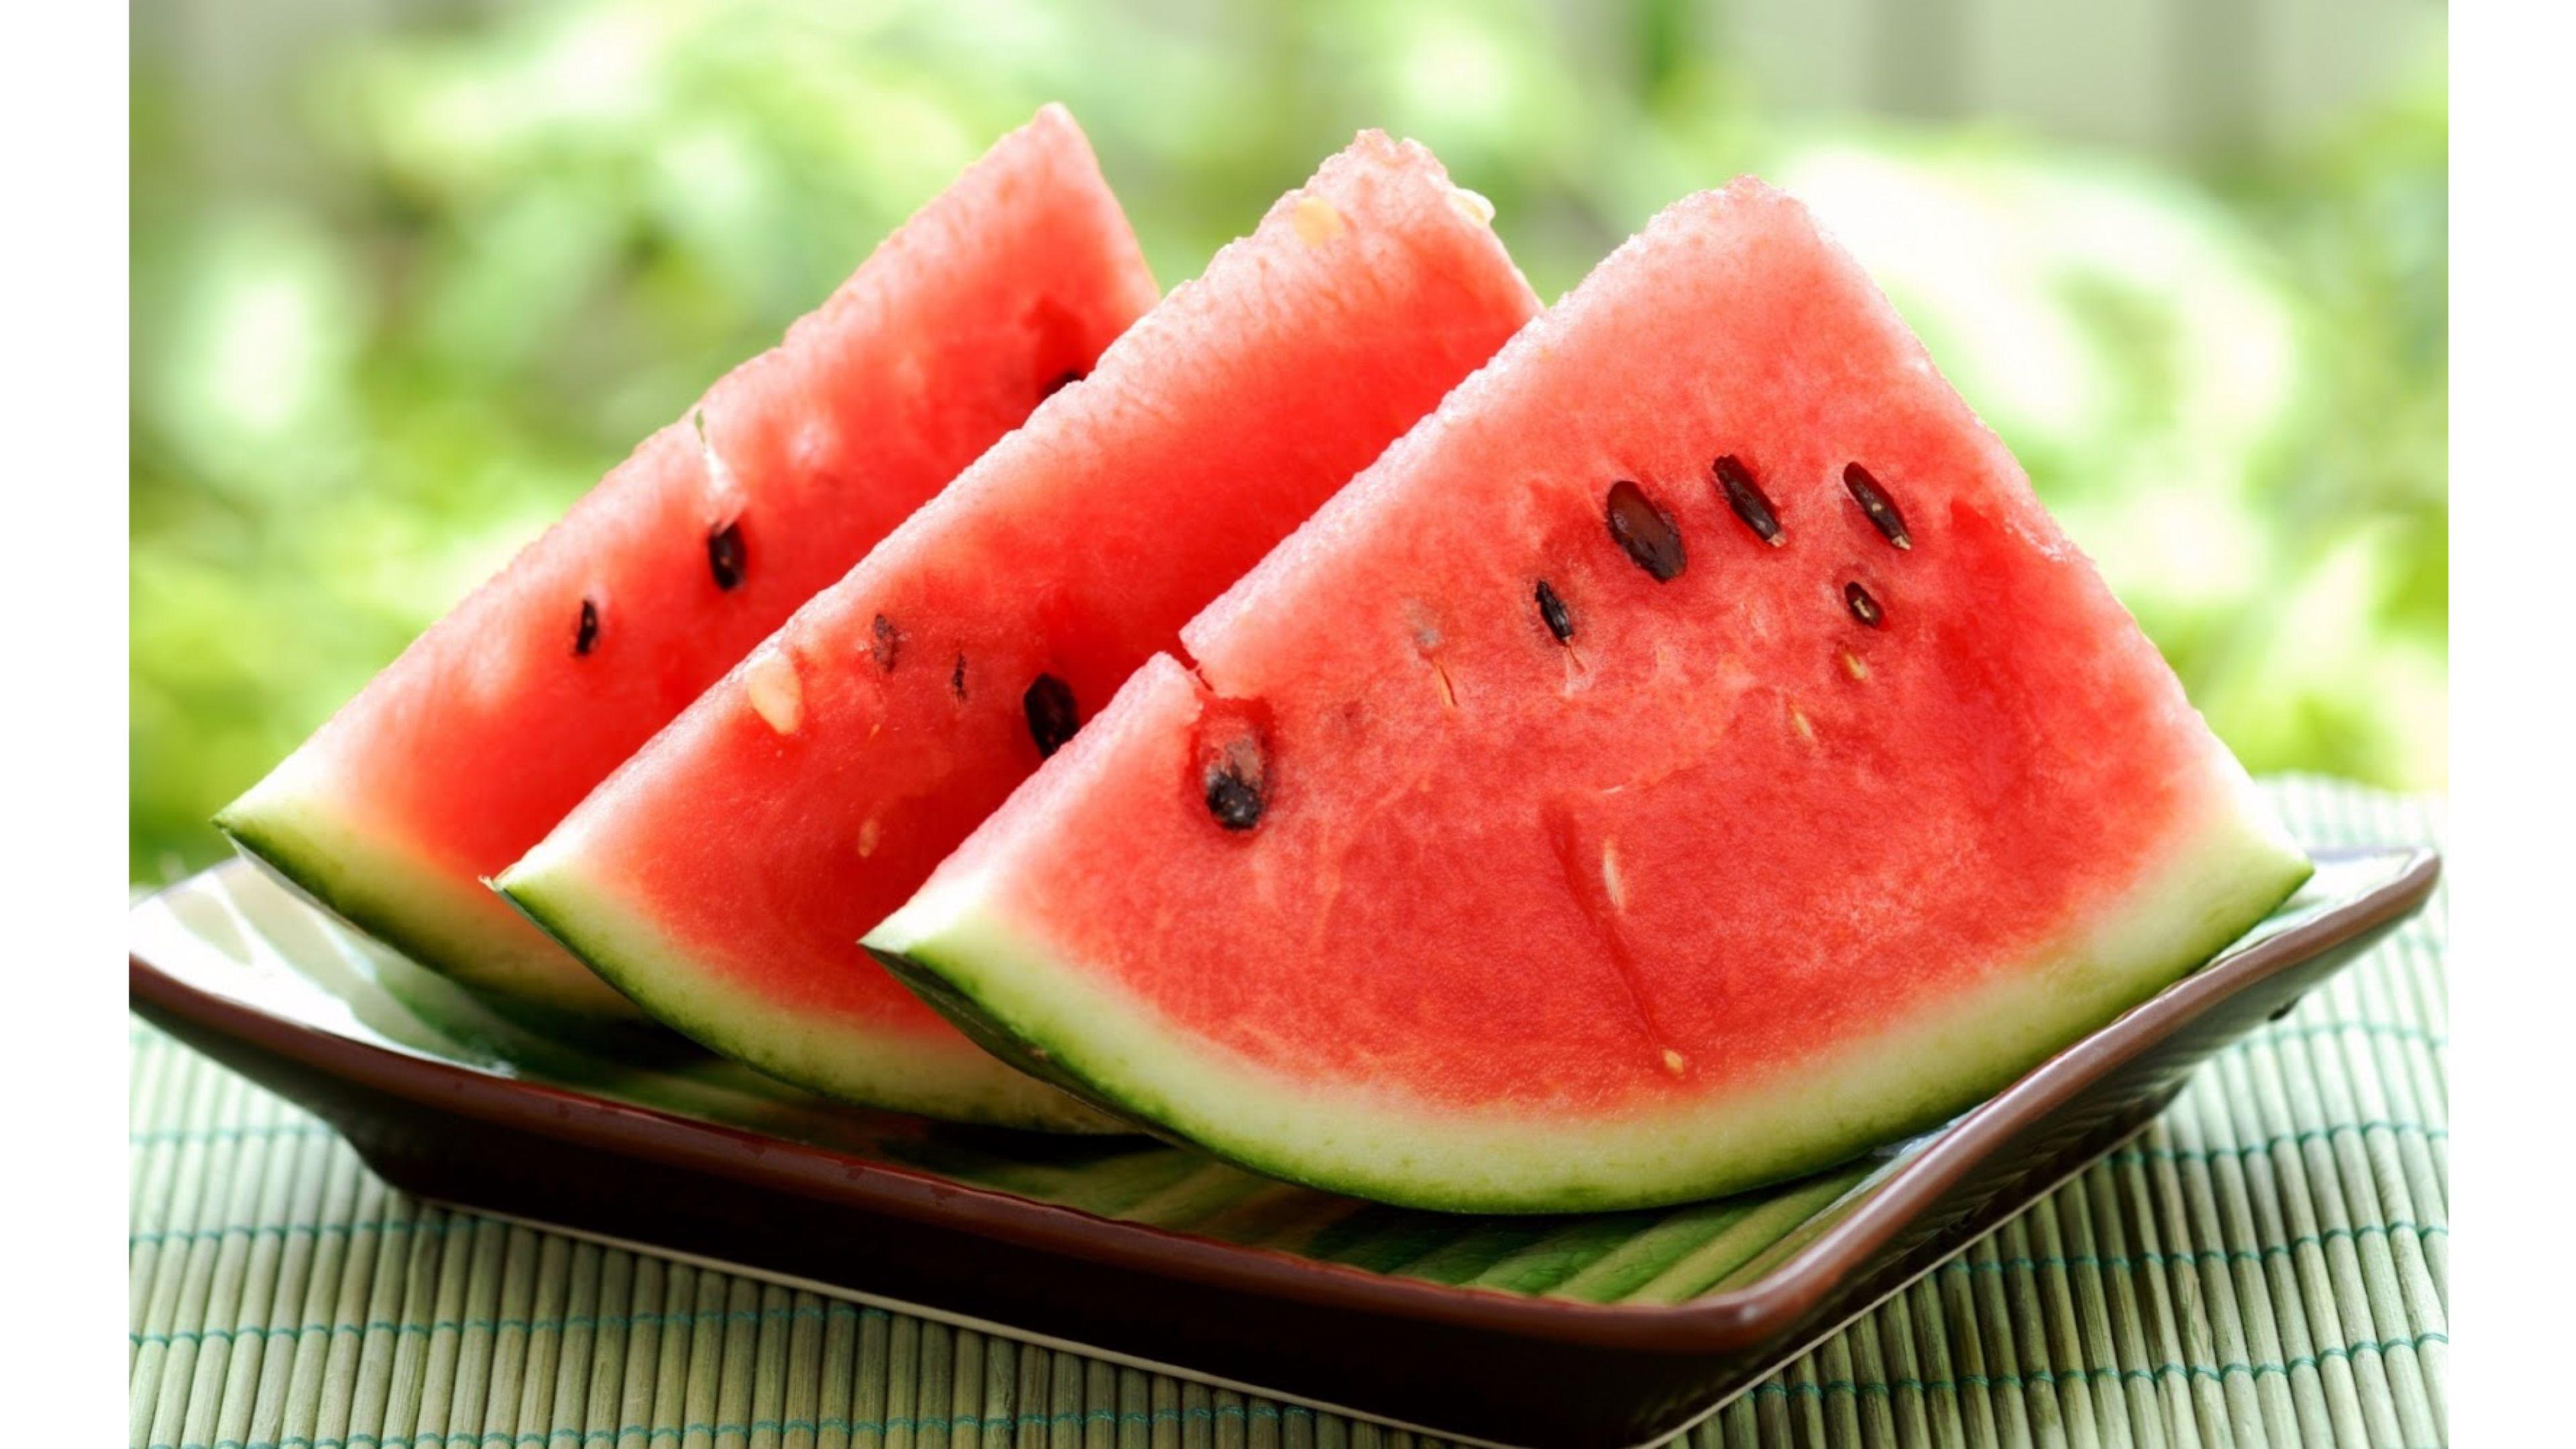 Watermelon Summer Wallpapers - Wallpaper Cave